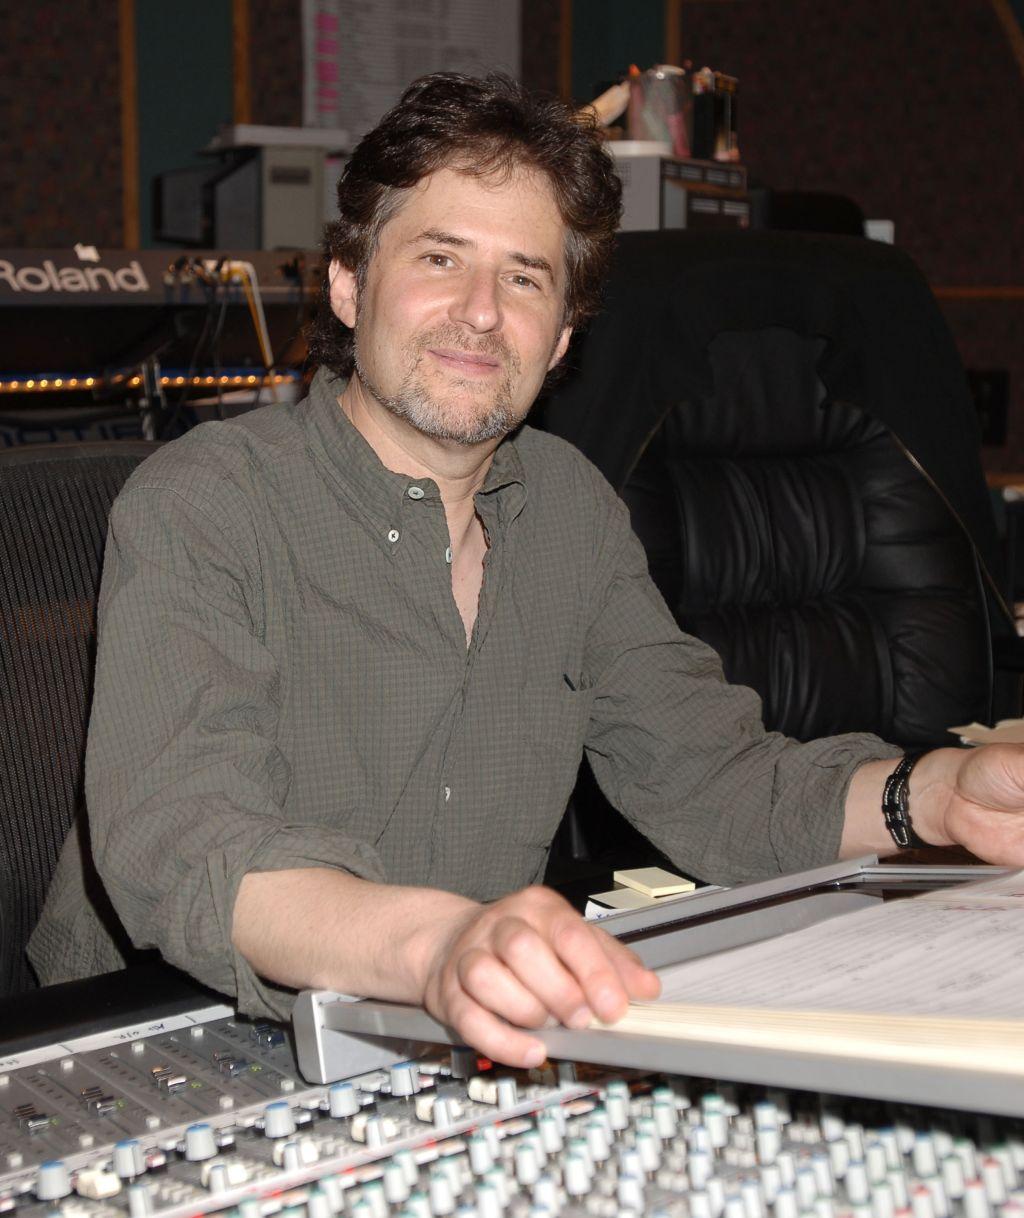 Composer James Horner Scores 'The Legend of Zorro' - Recording Session -...